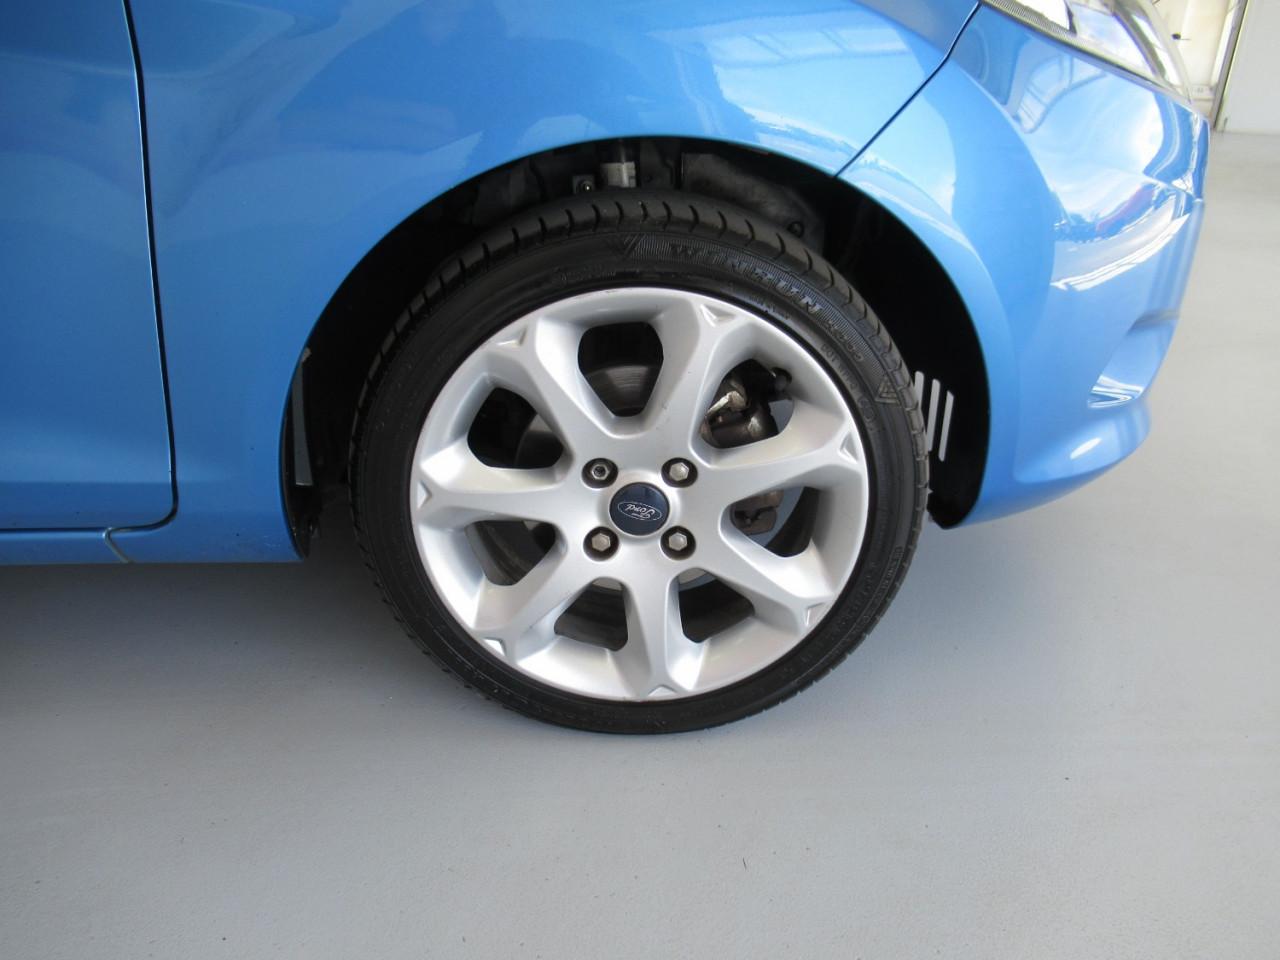 2009 Ford Fiesta WS CL Hatchback Image 11